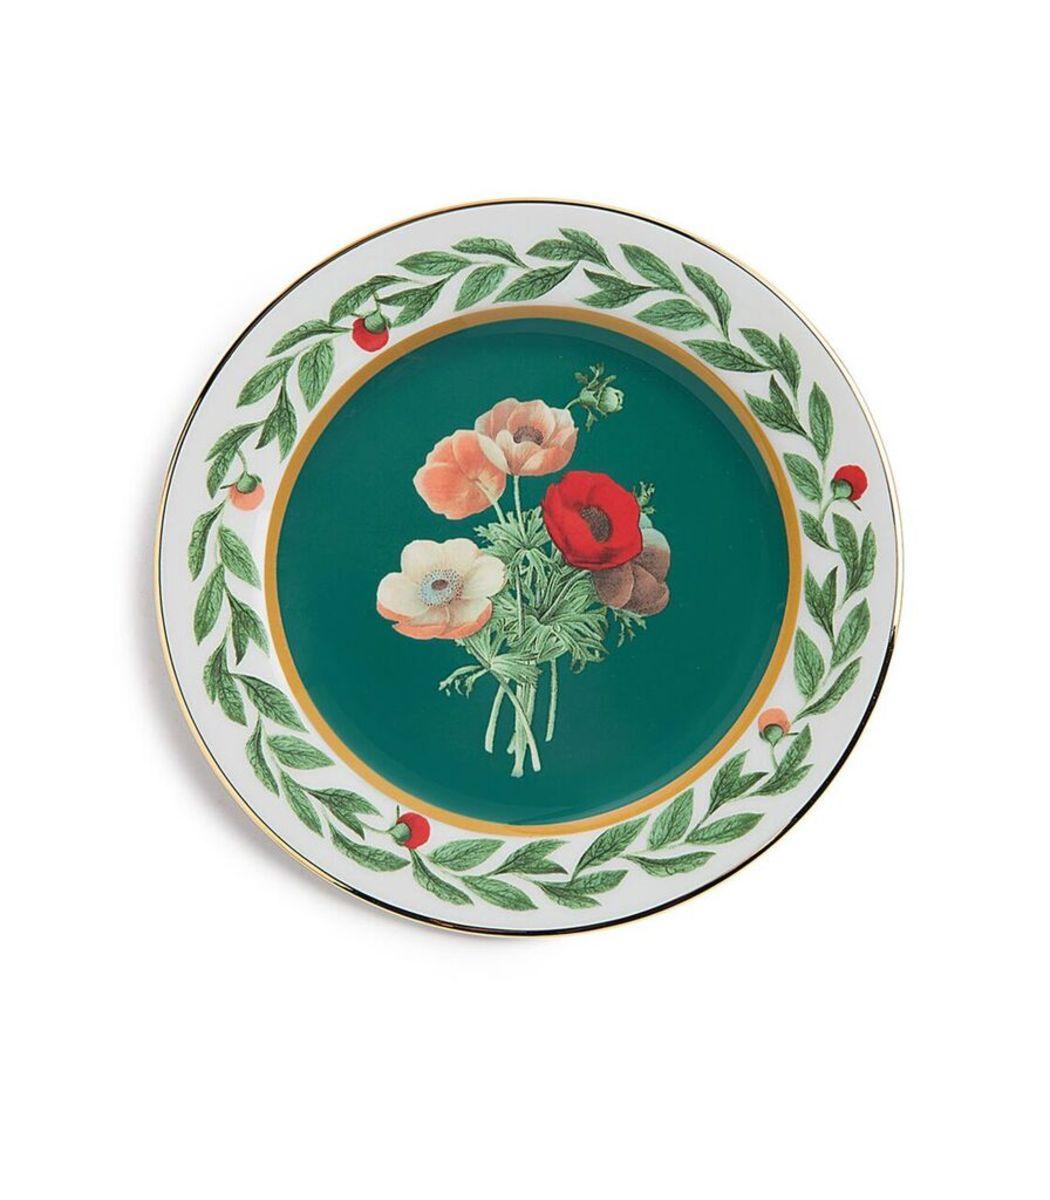 LA DOUBLEJ Green Housewives Posie Dessert Plates (Set of 2)